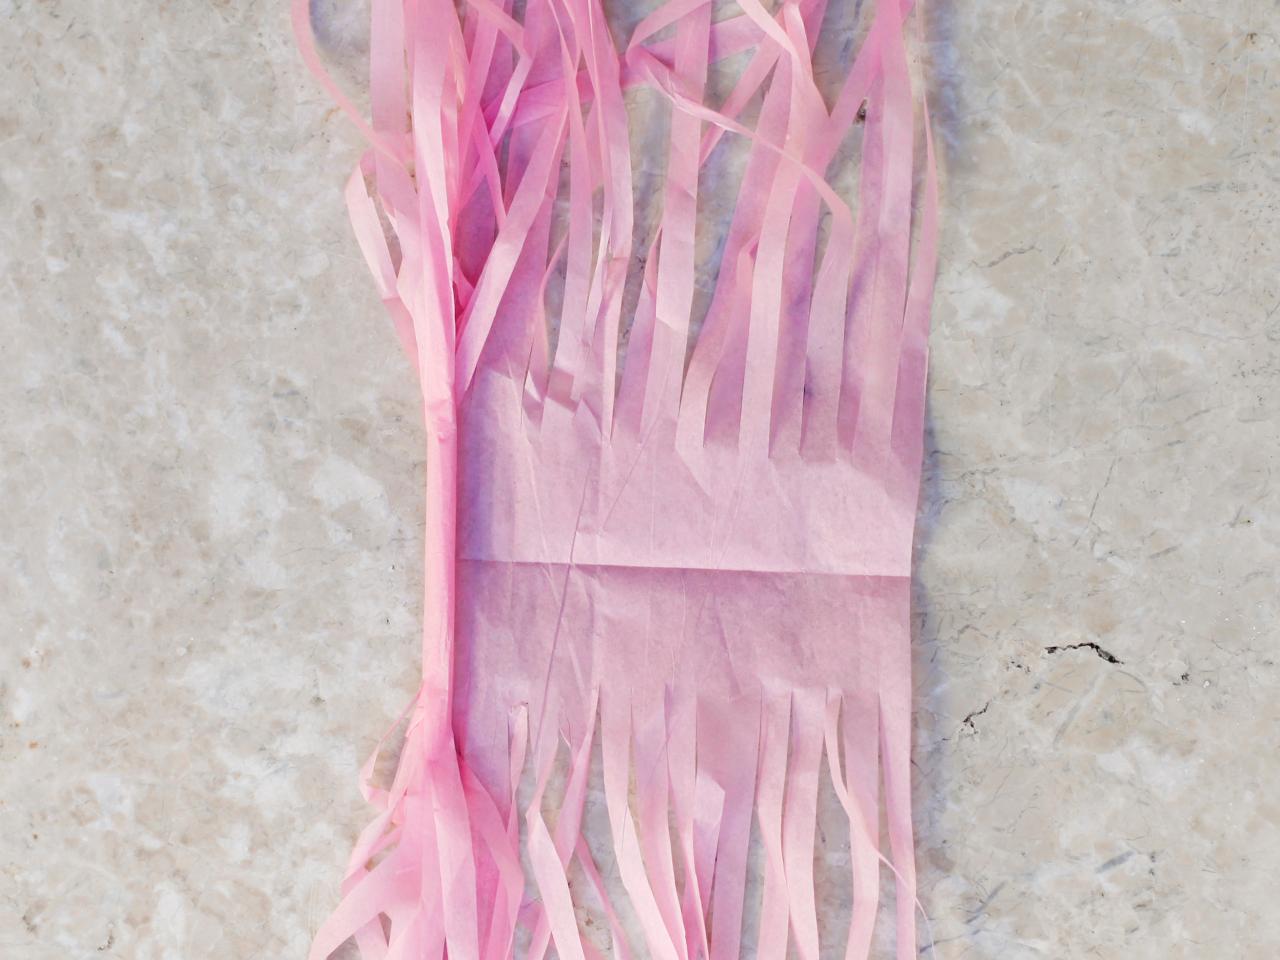 Tissue paper tassel tutorial - Pink Tissue Paper With Cut Fringe